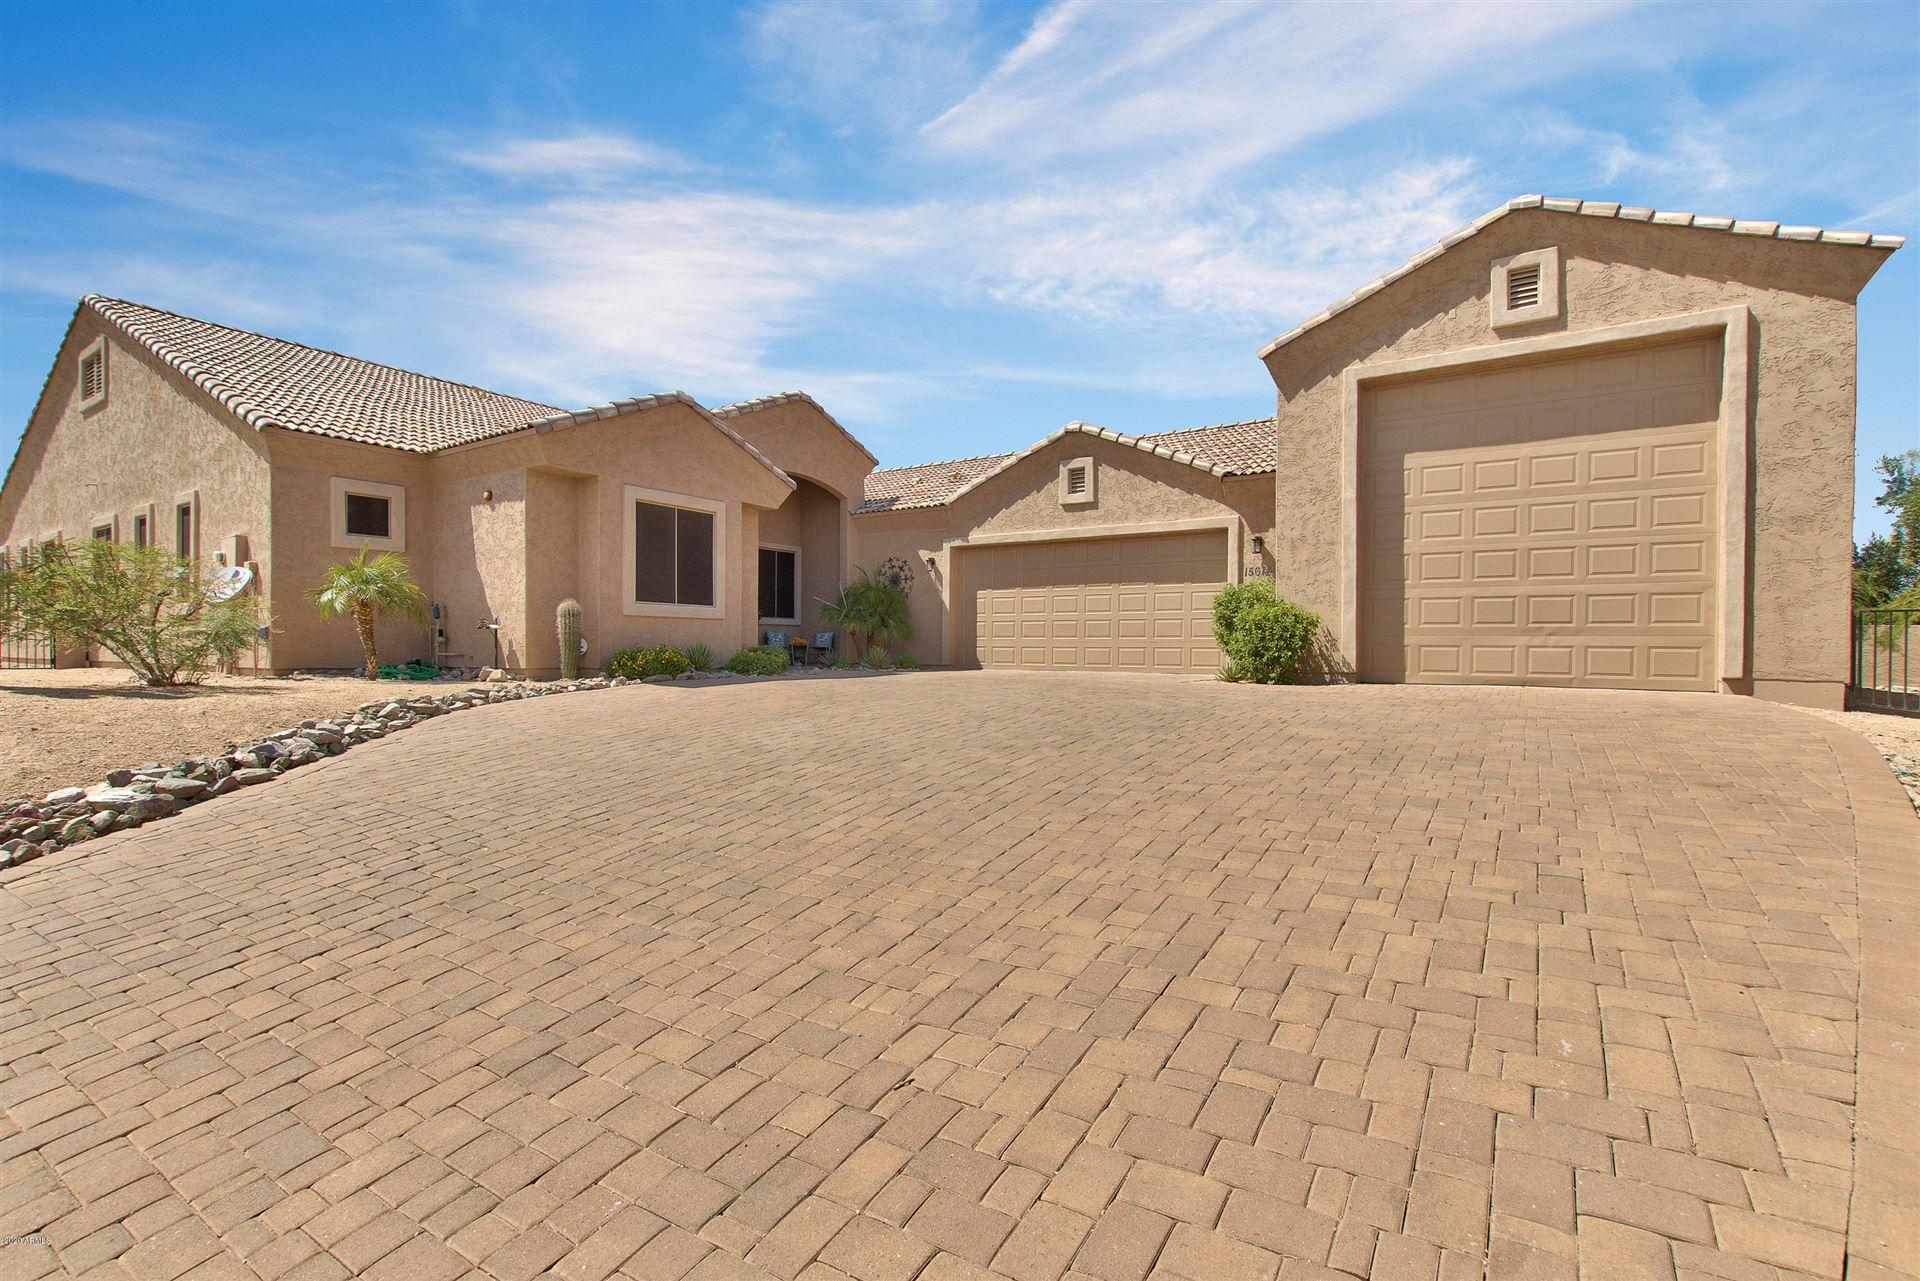 15614 E Chicory Drive, Fountain Hills, AZ 85268 - MLS#: 6113415